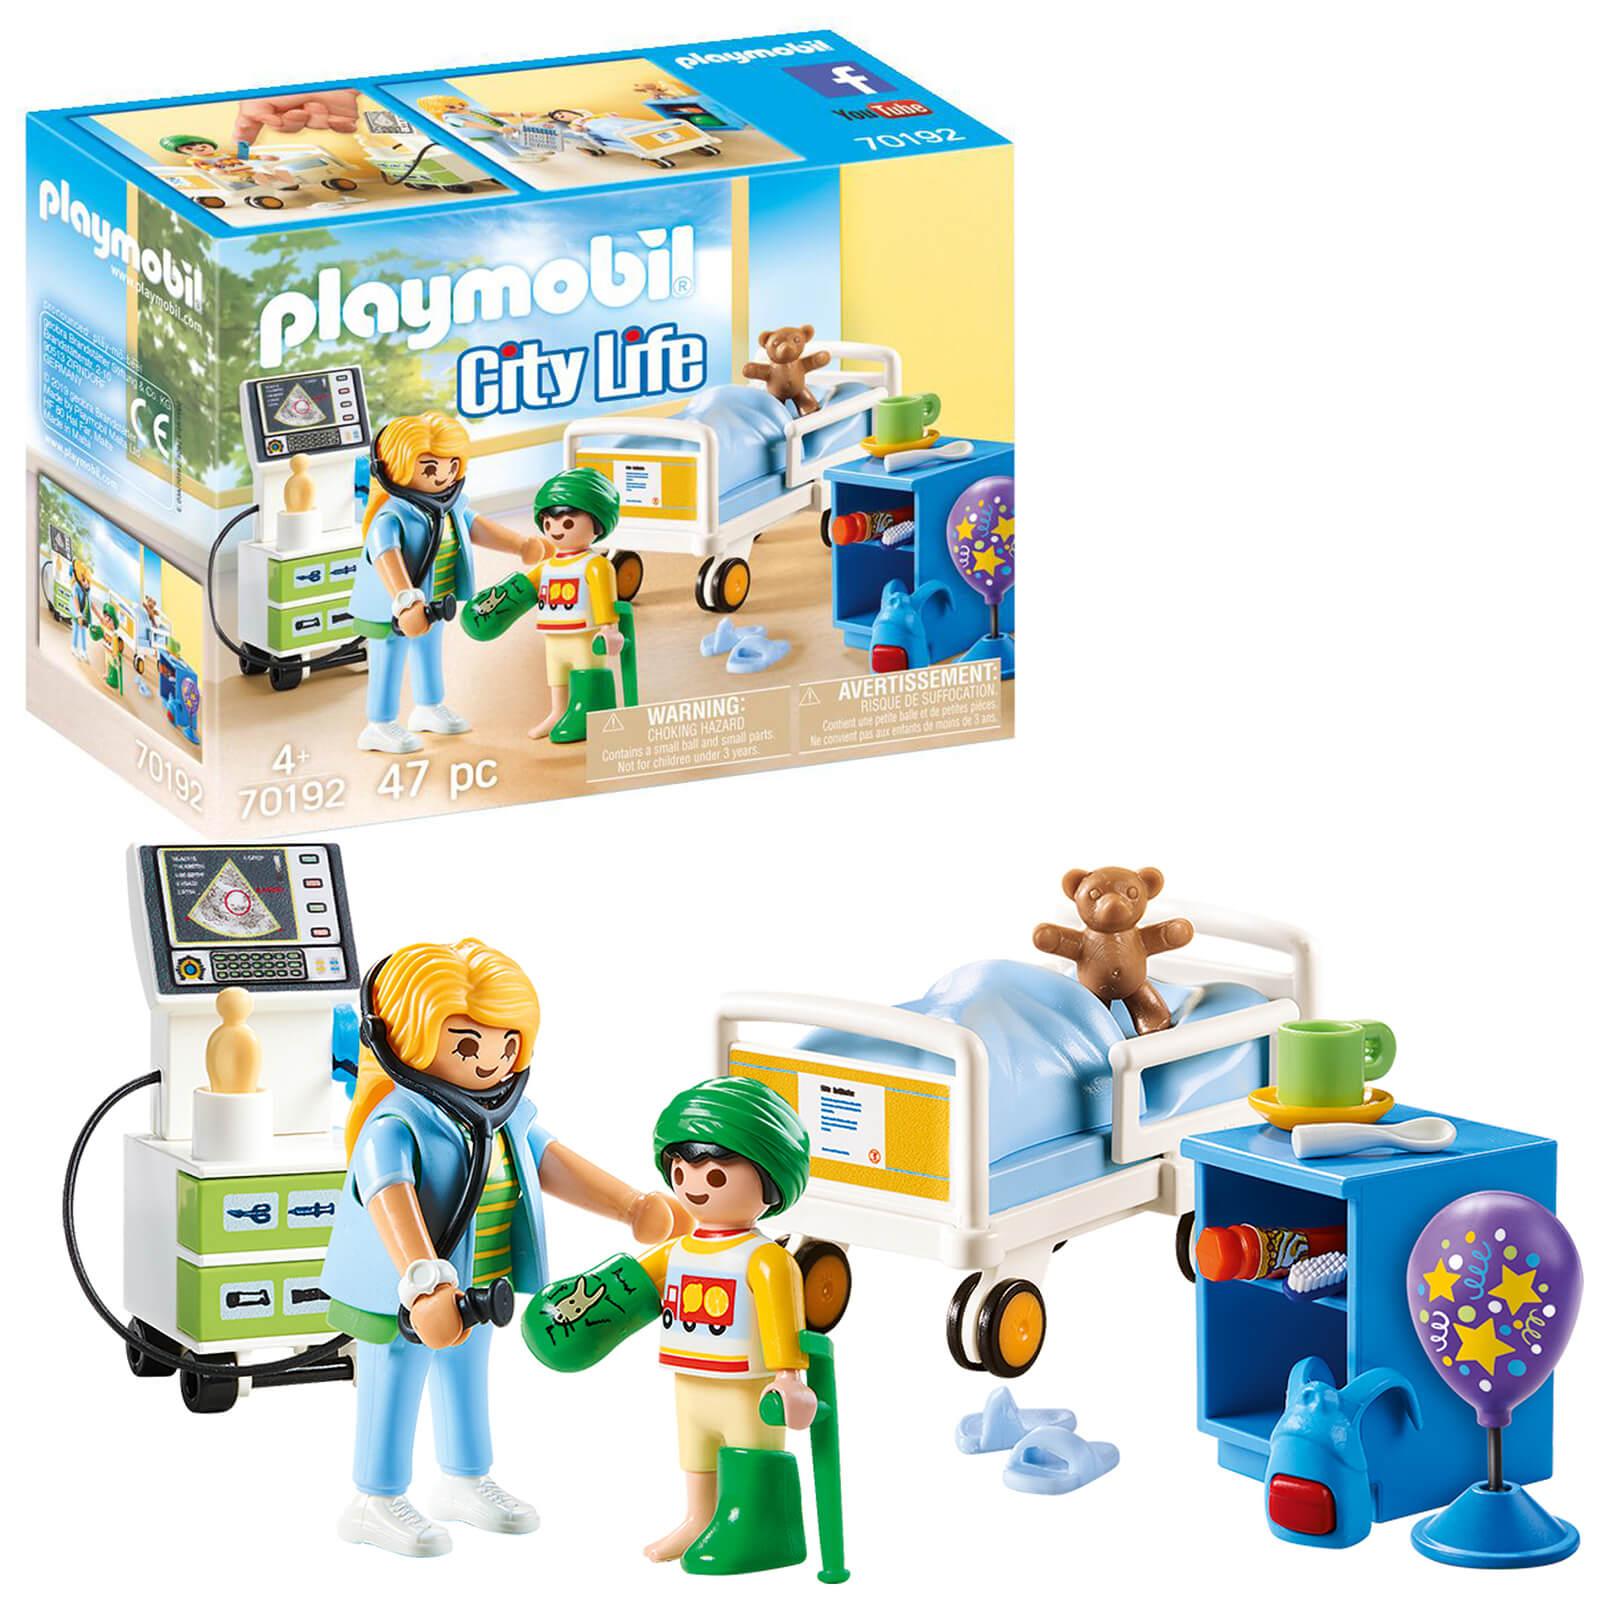 Playmobil City Life Childrens Hospital Room (70192)